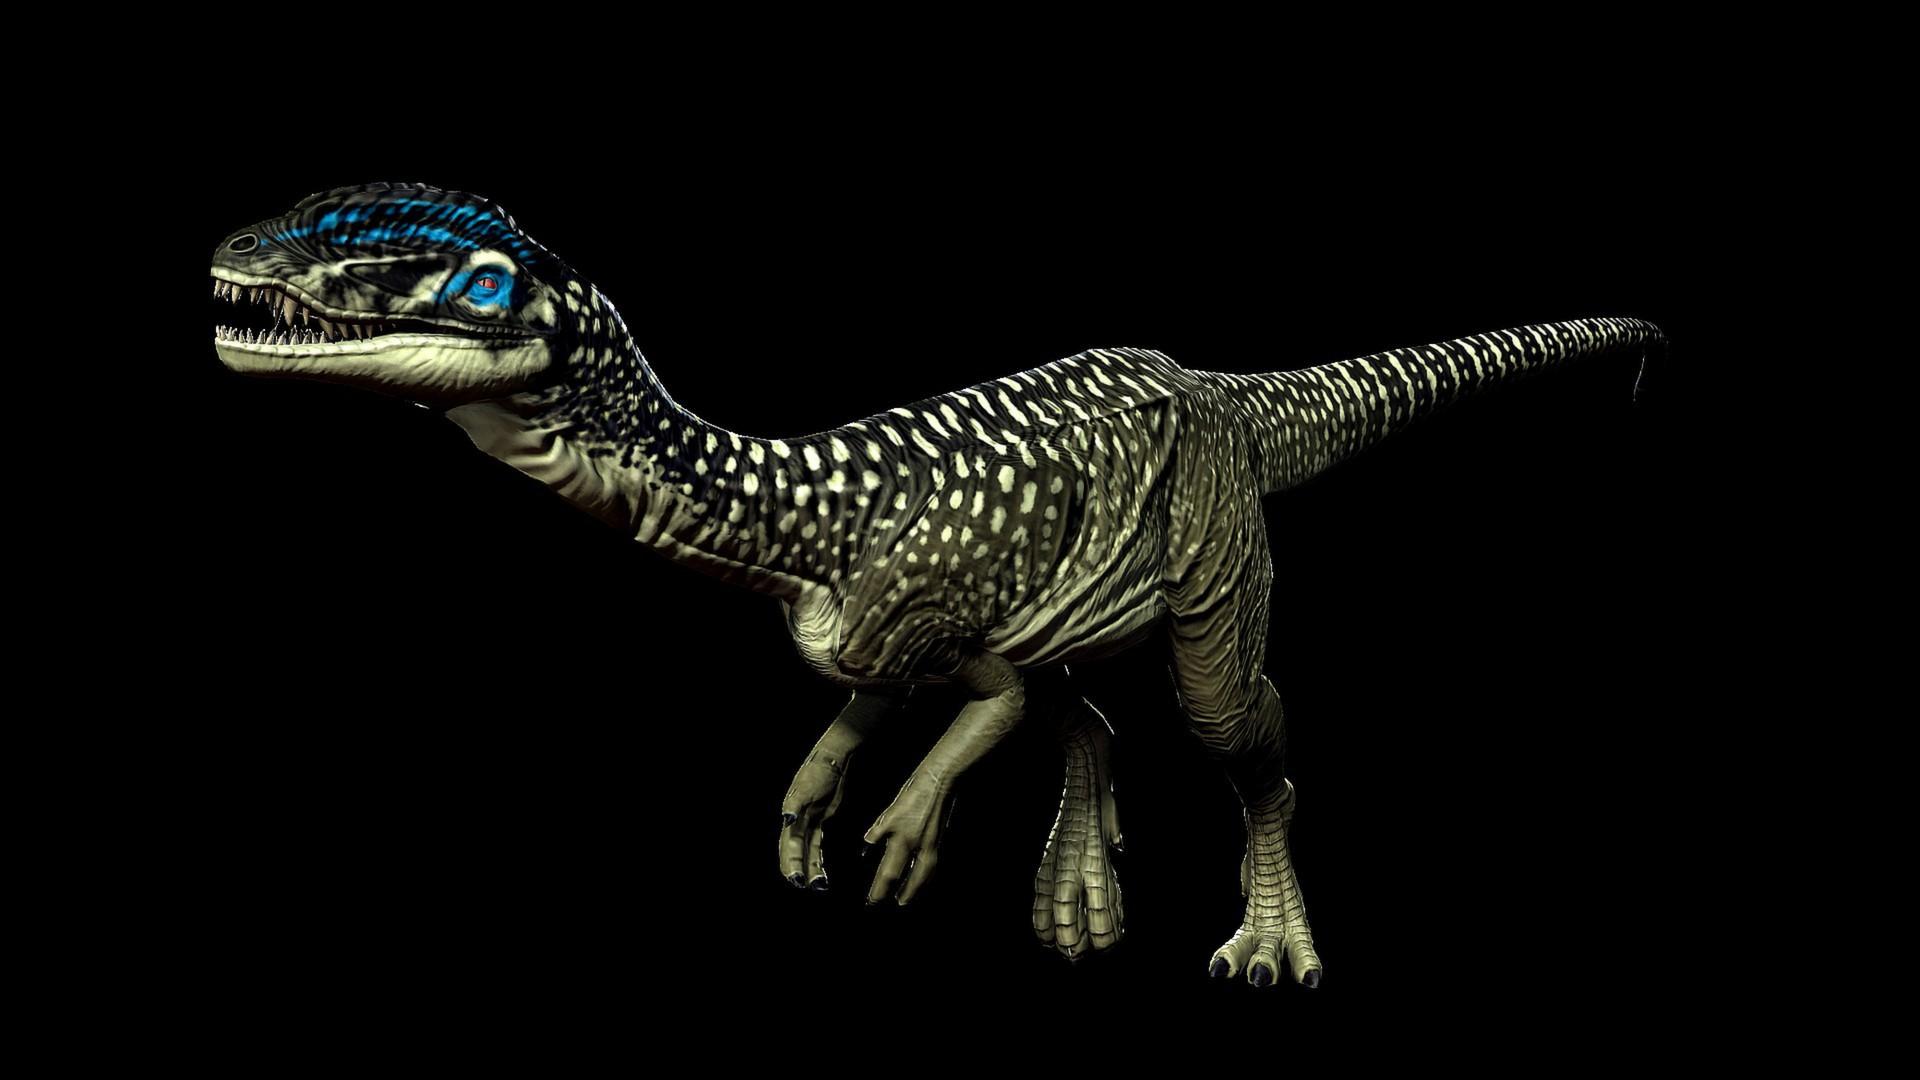 dilophosaurus primal carnage - photo #7